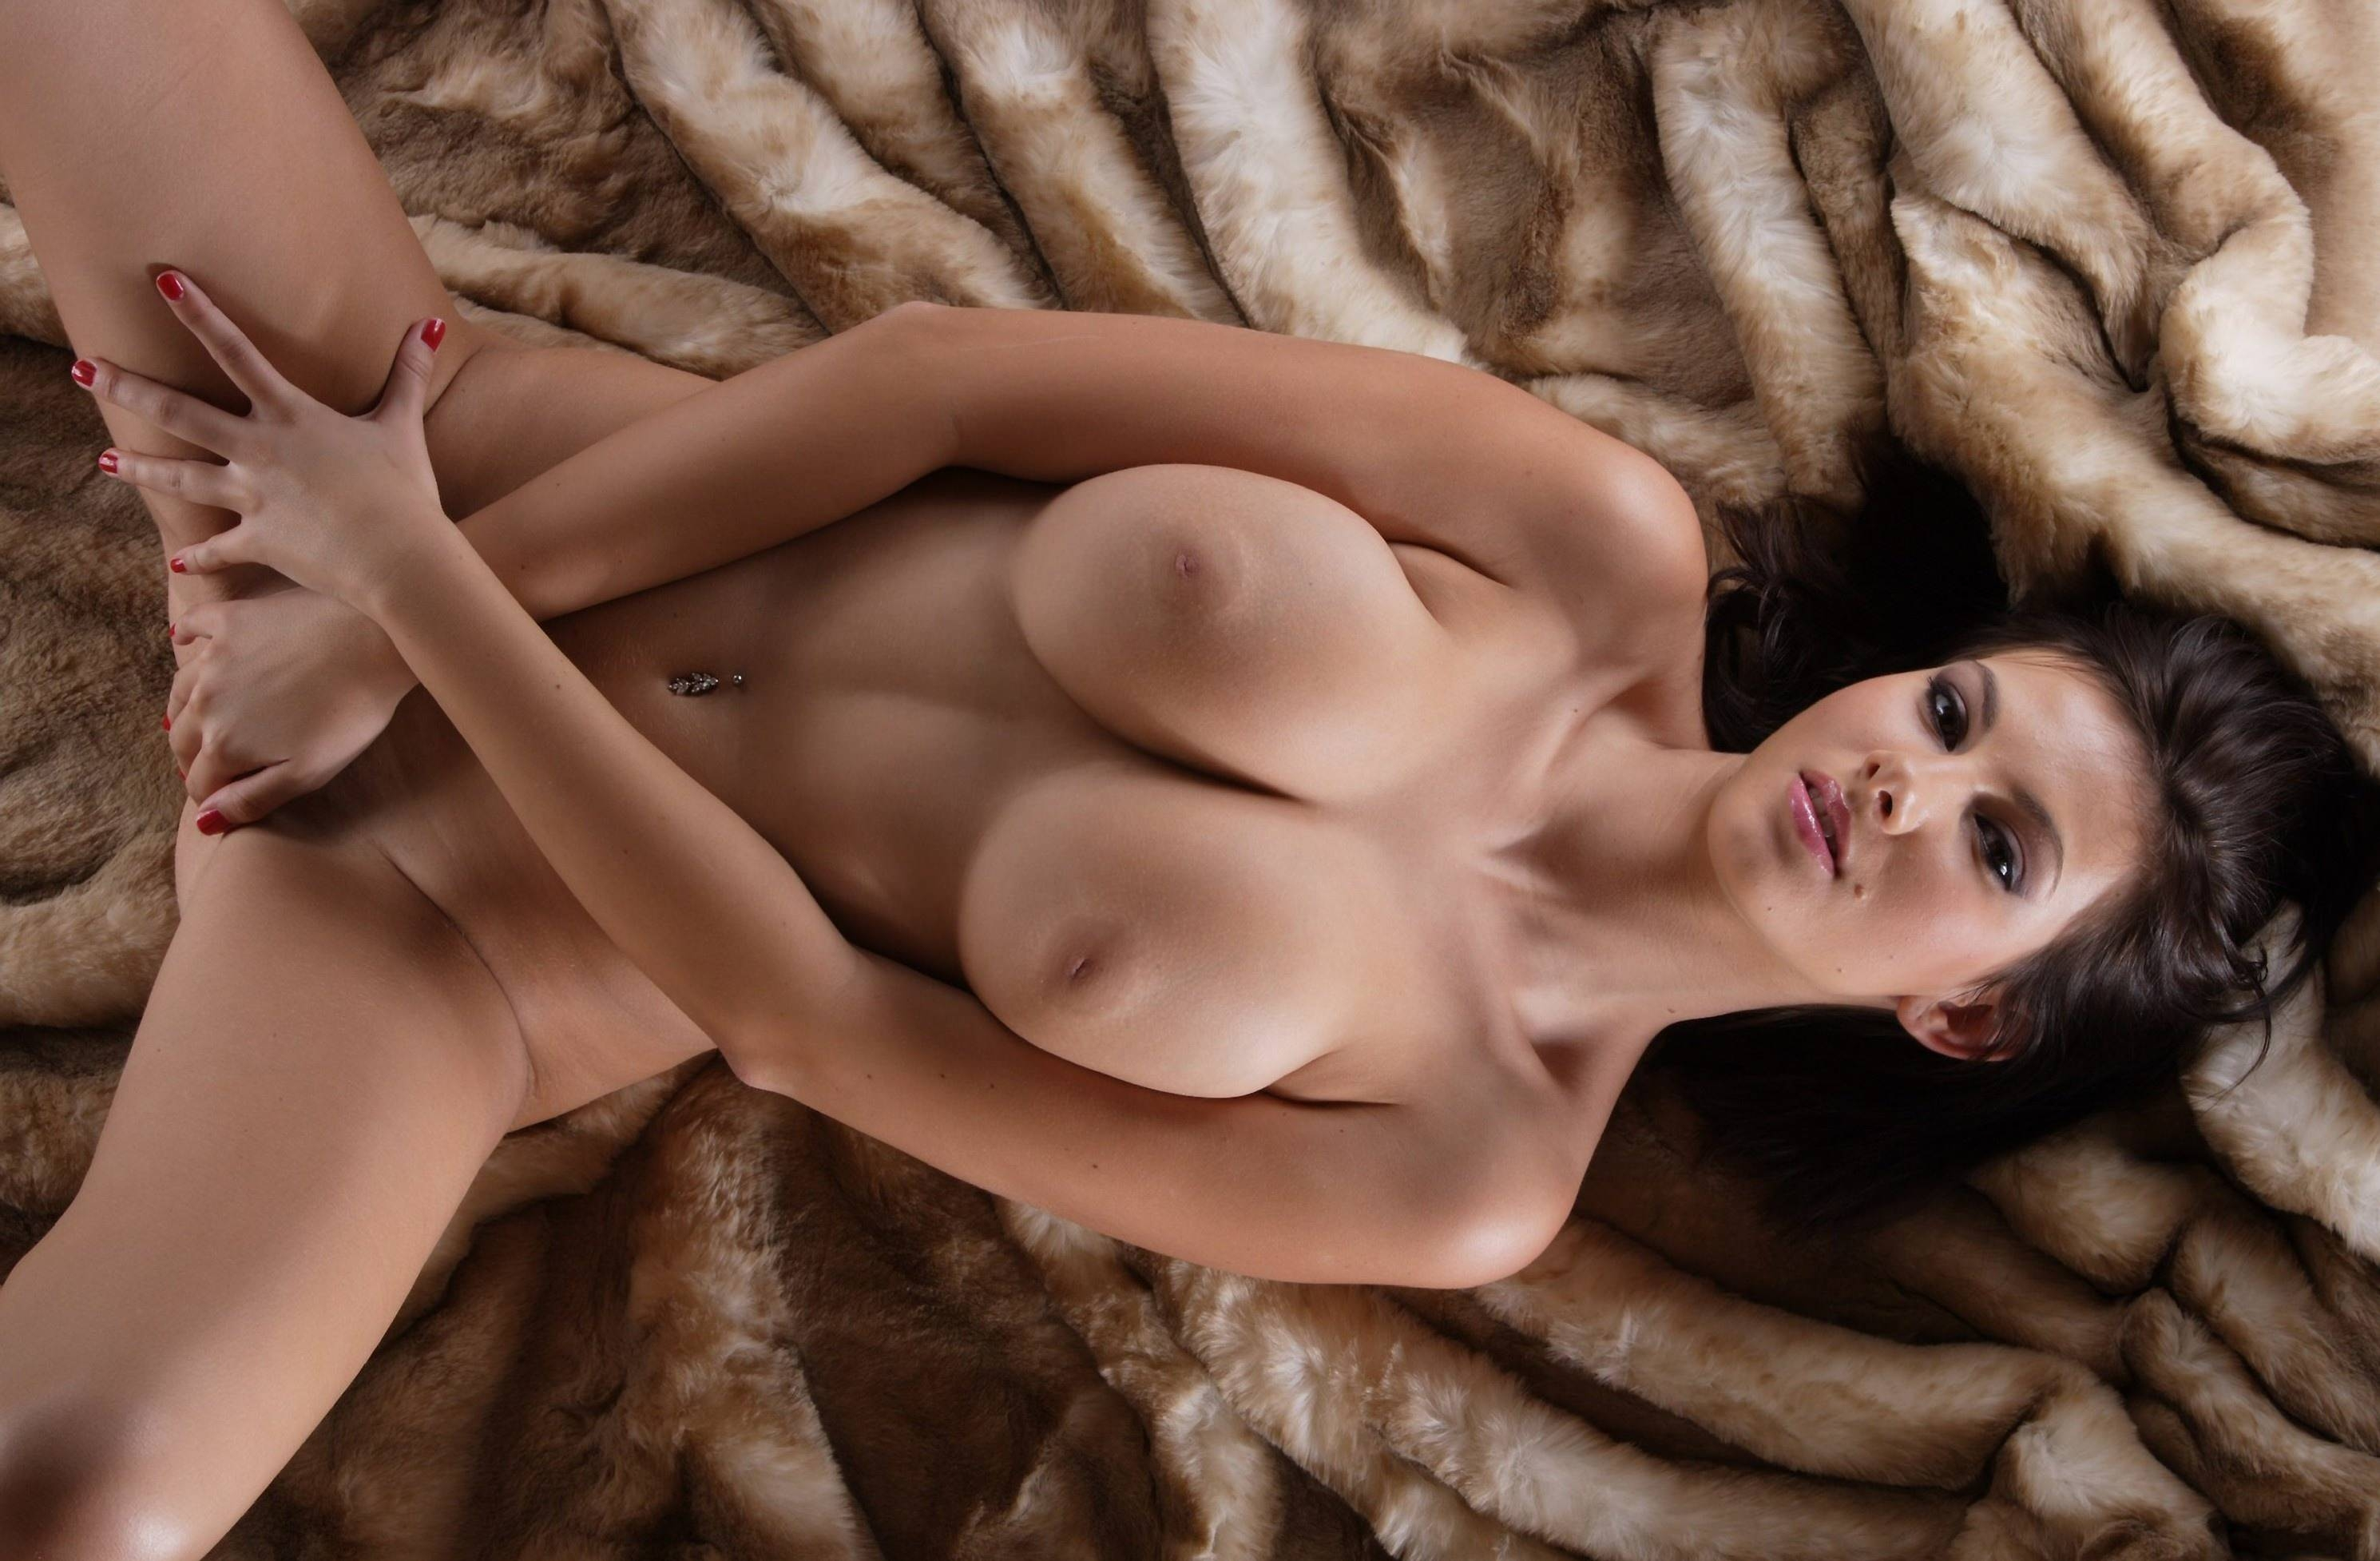 Nude pics of linda carter hooker fucked